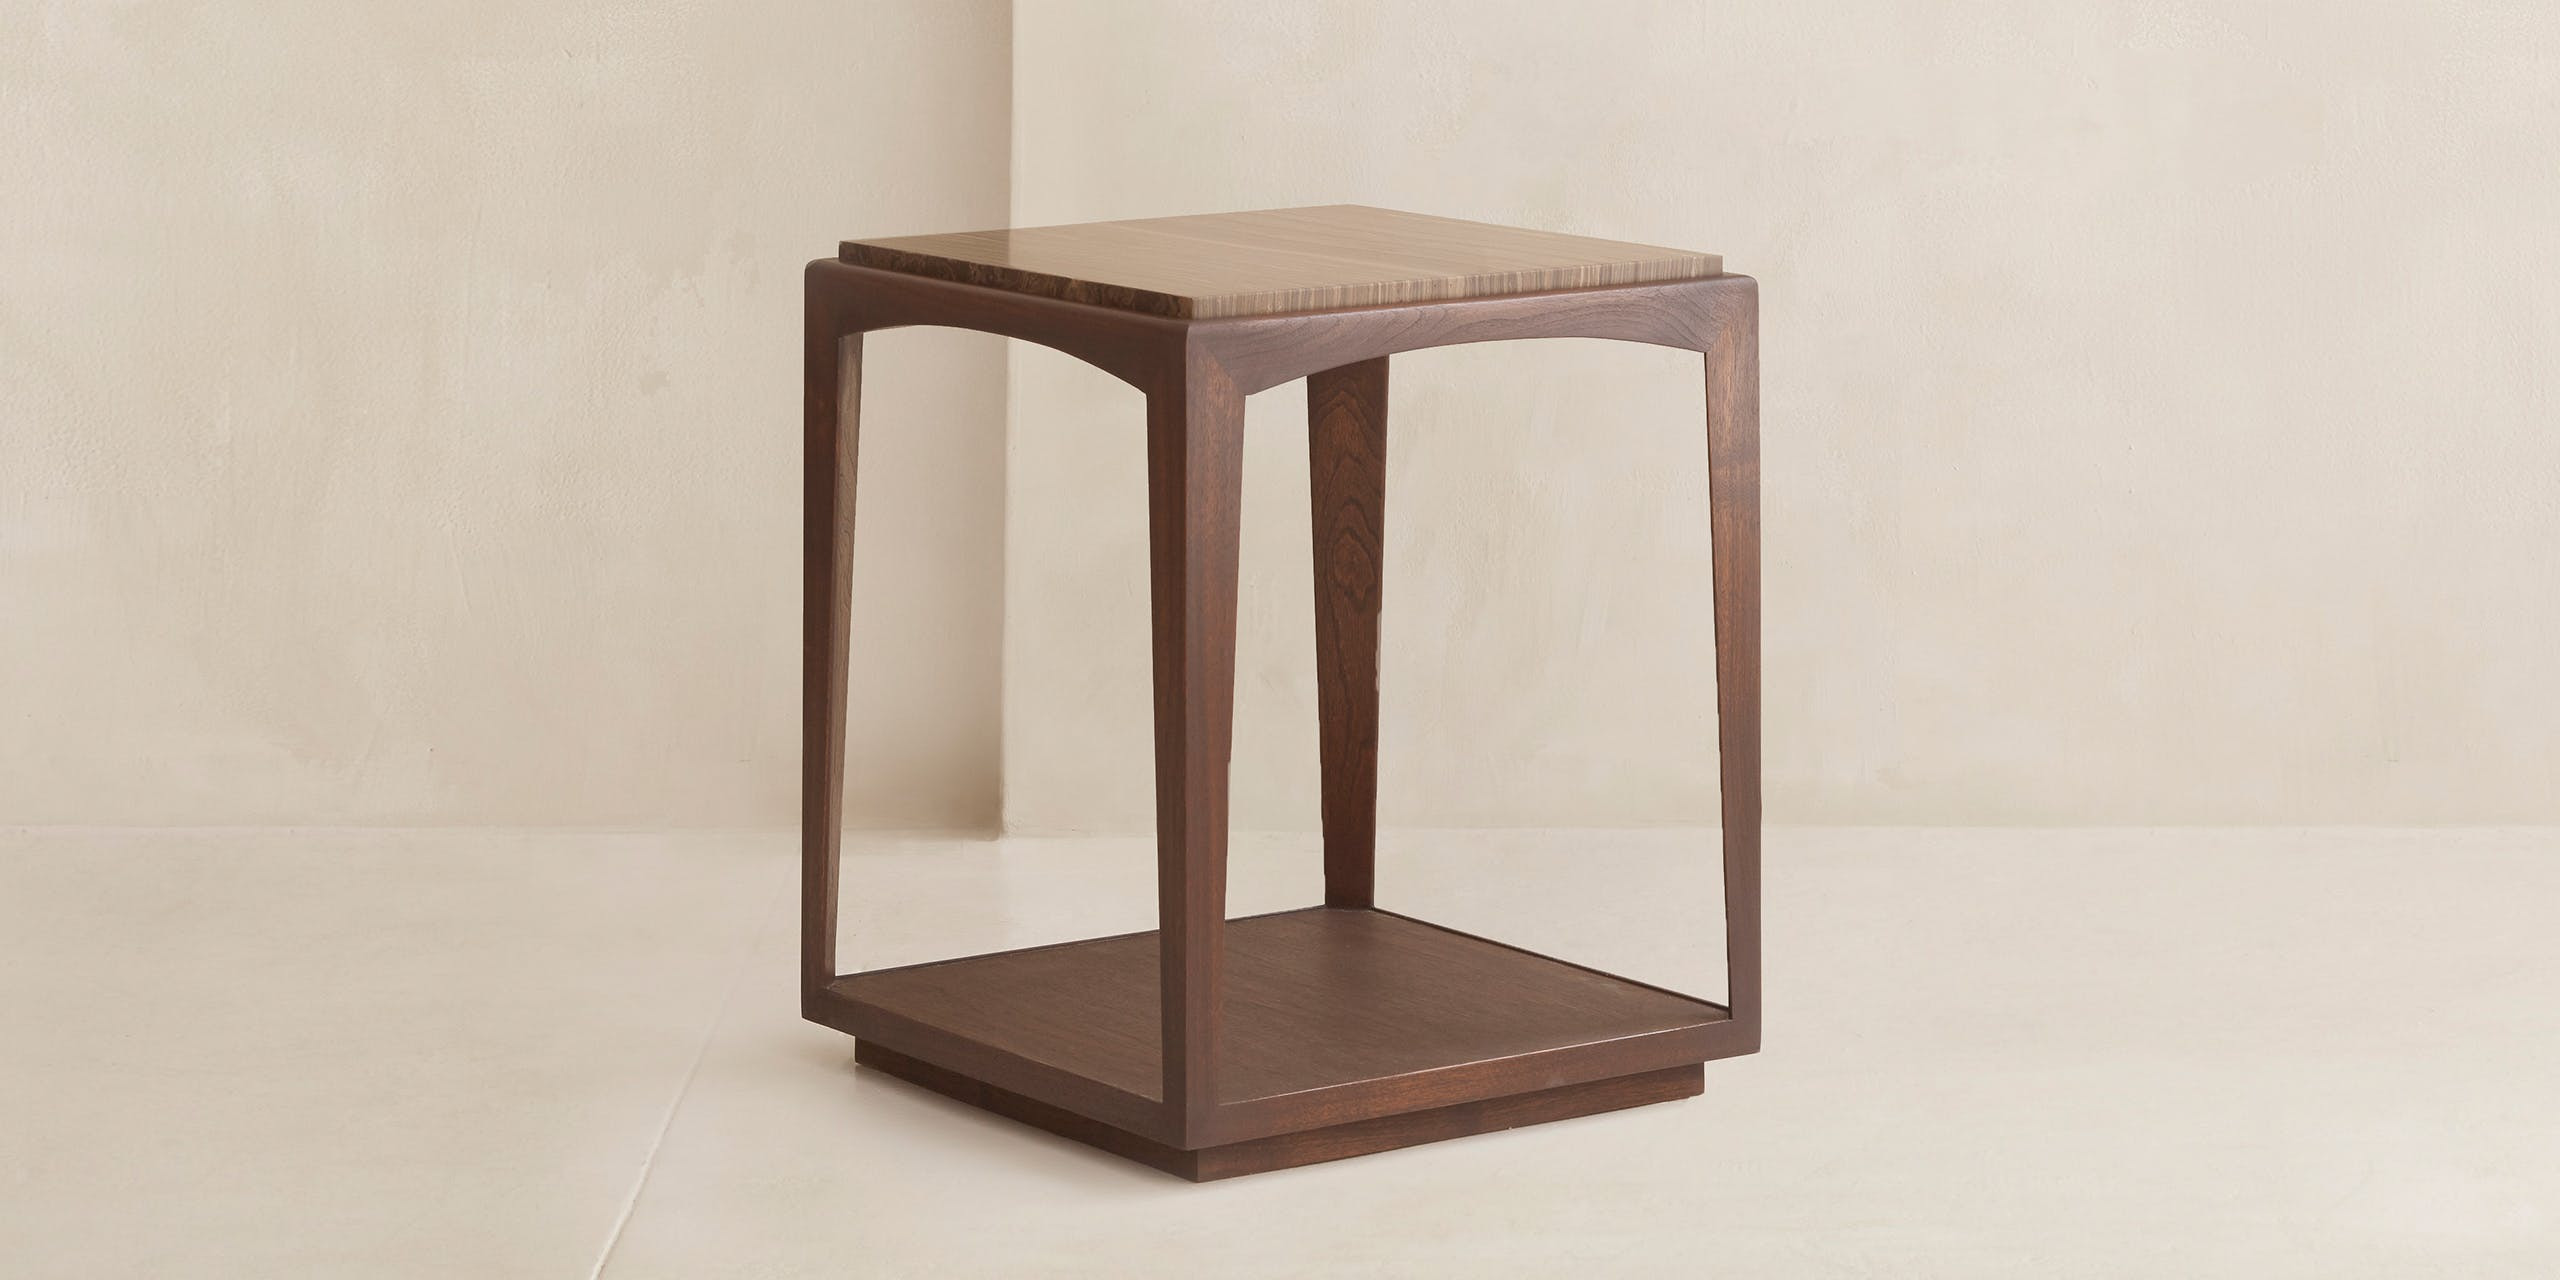 Avery table low stone main.jpg?ixlib=rails 2.1